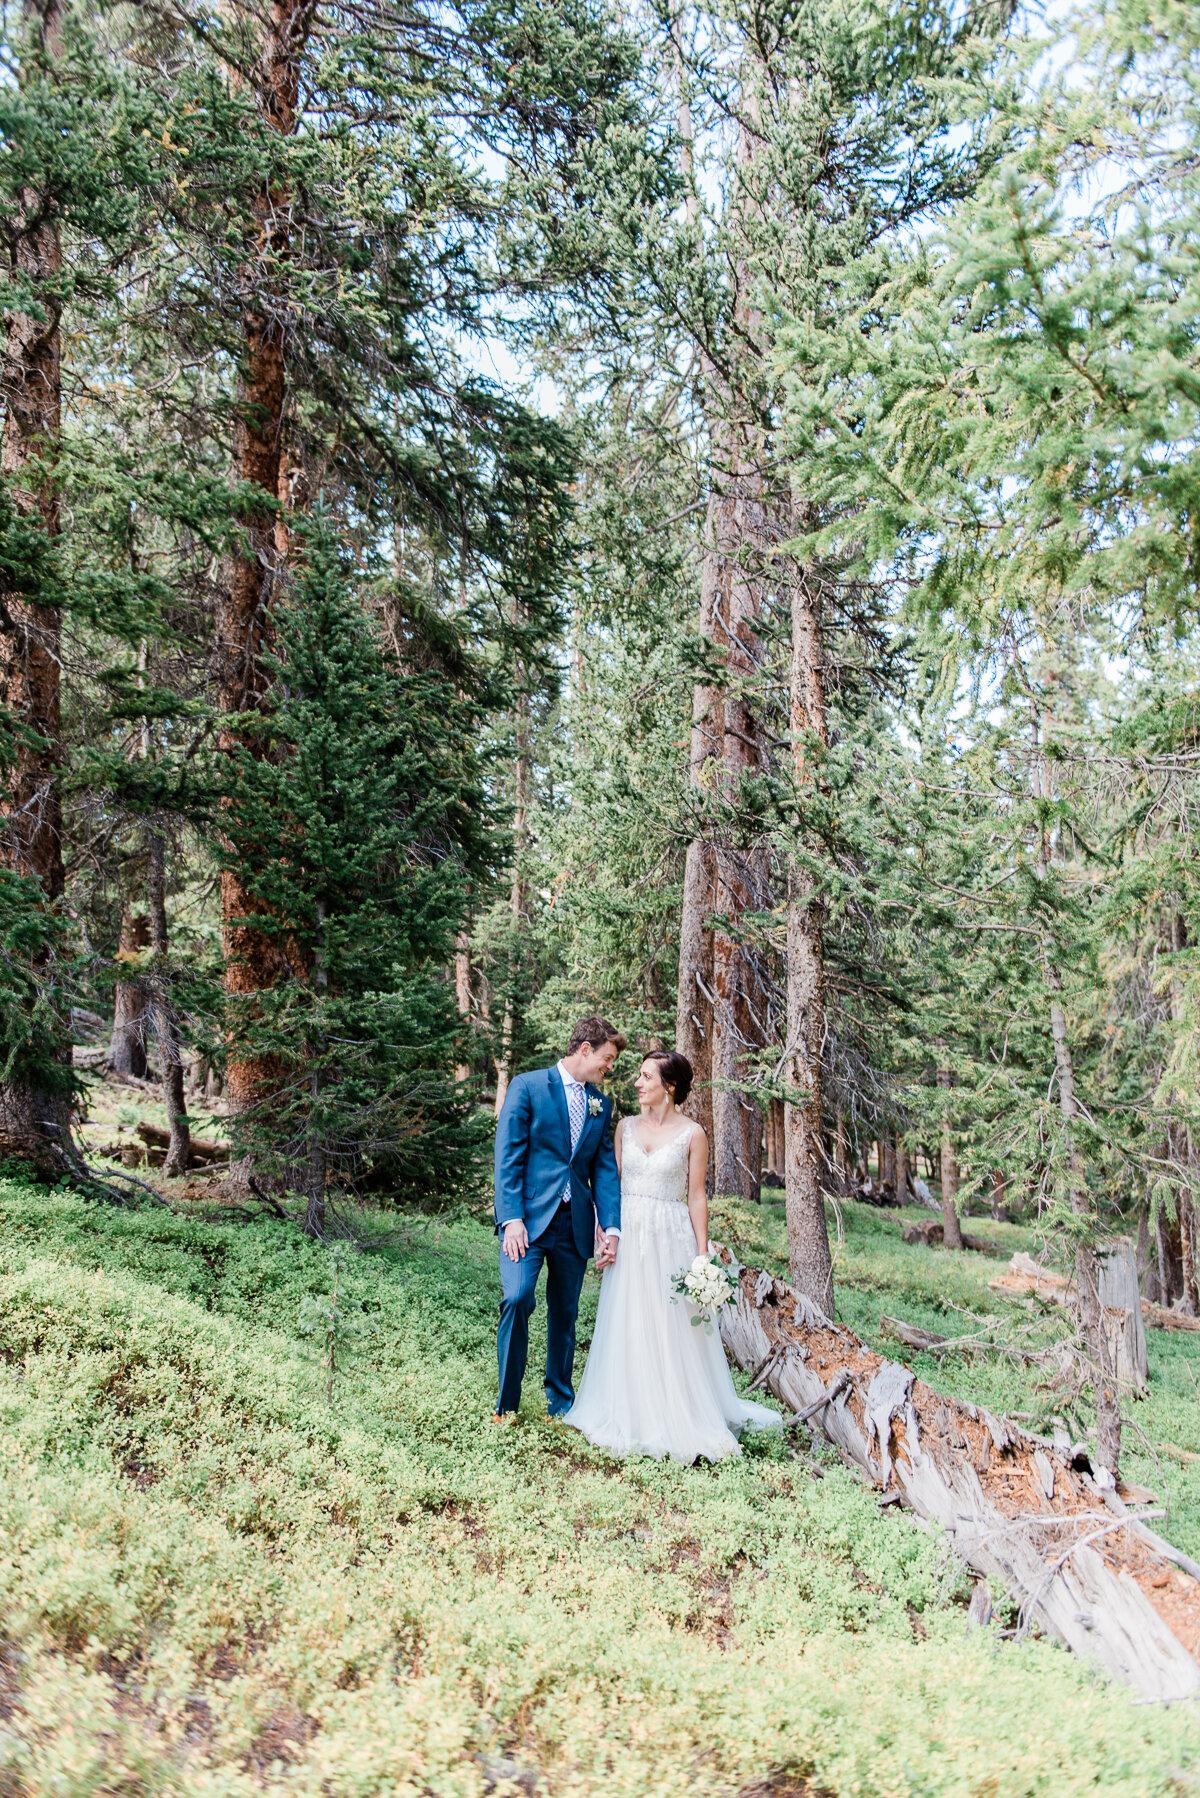 AshleighMillerPhotography-Wedding-Natalia-Matt-ArapahoeBasin-Colorado-4.jpg